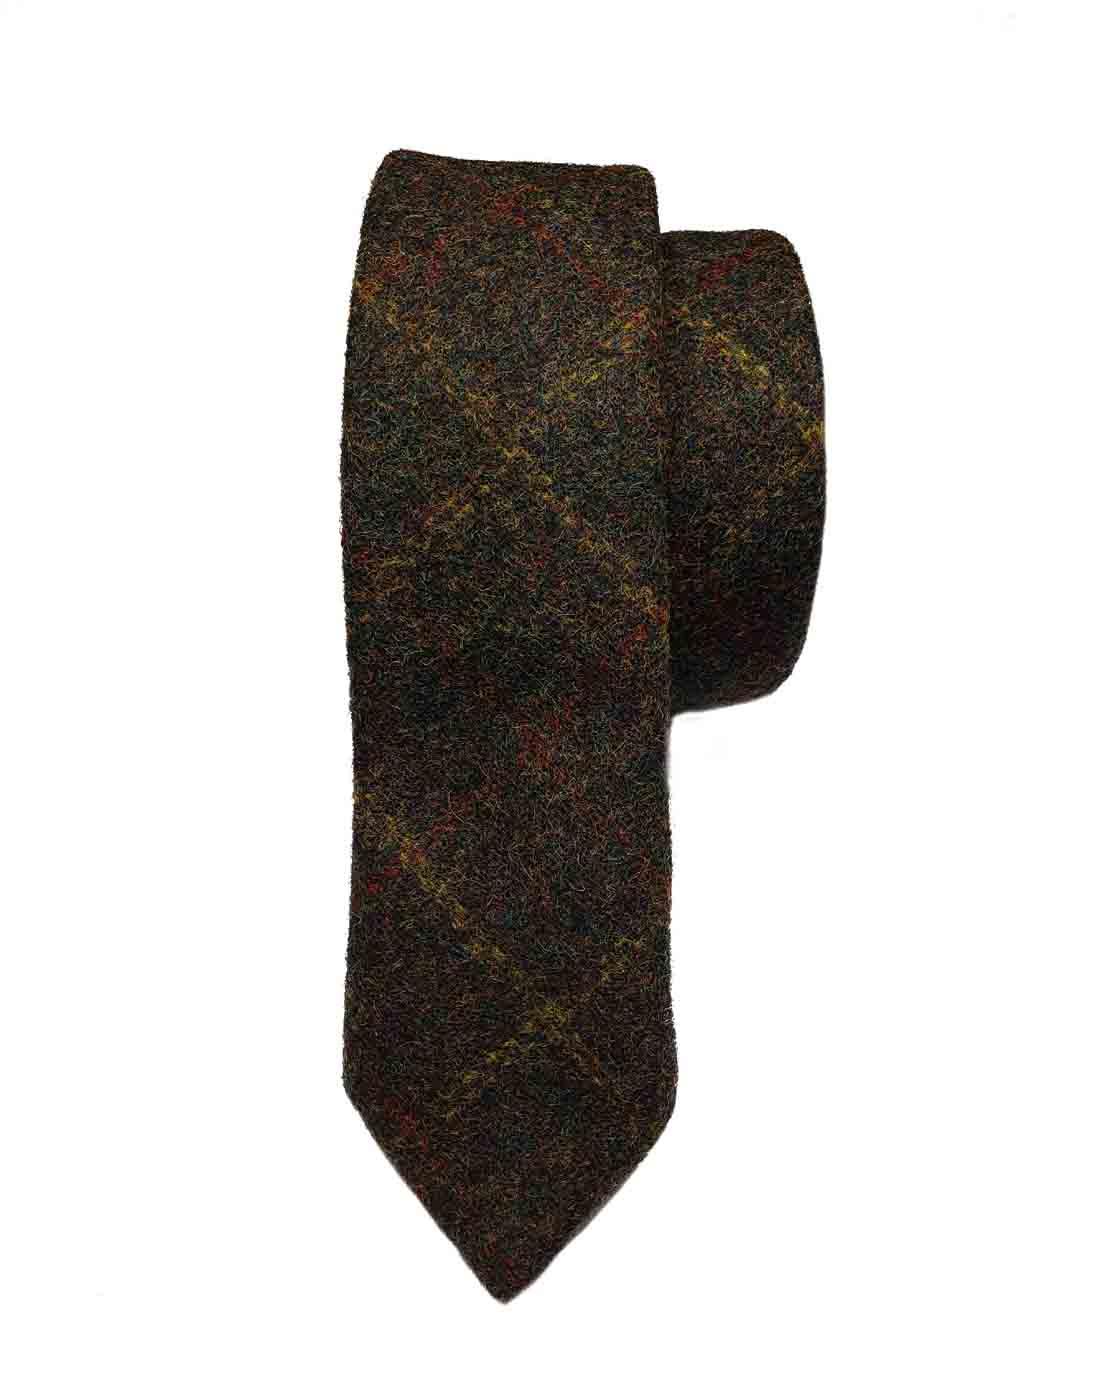 Gascoigne Wool Tweed Tie Olive Brown Gold Orange Men's Narrow